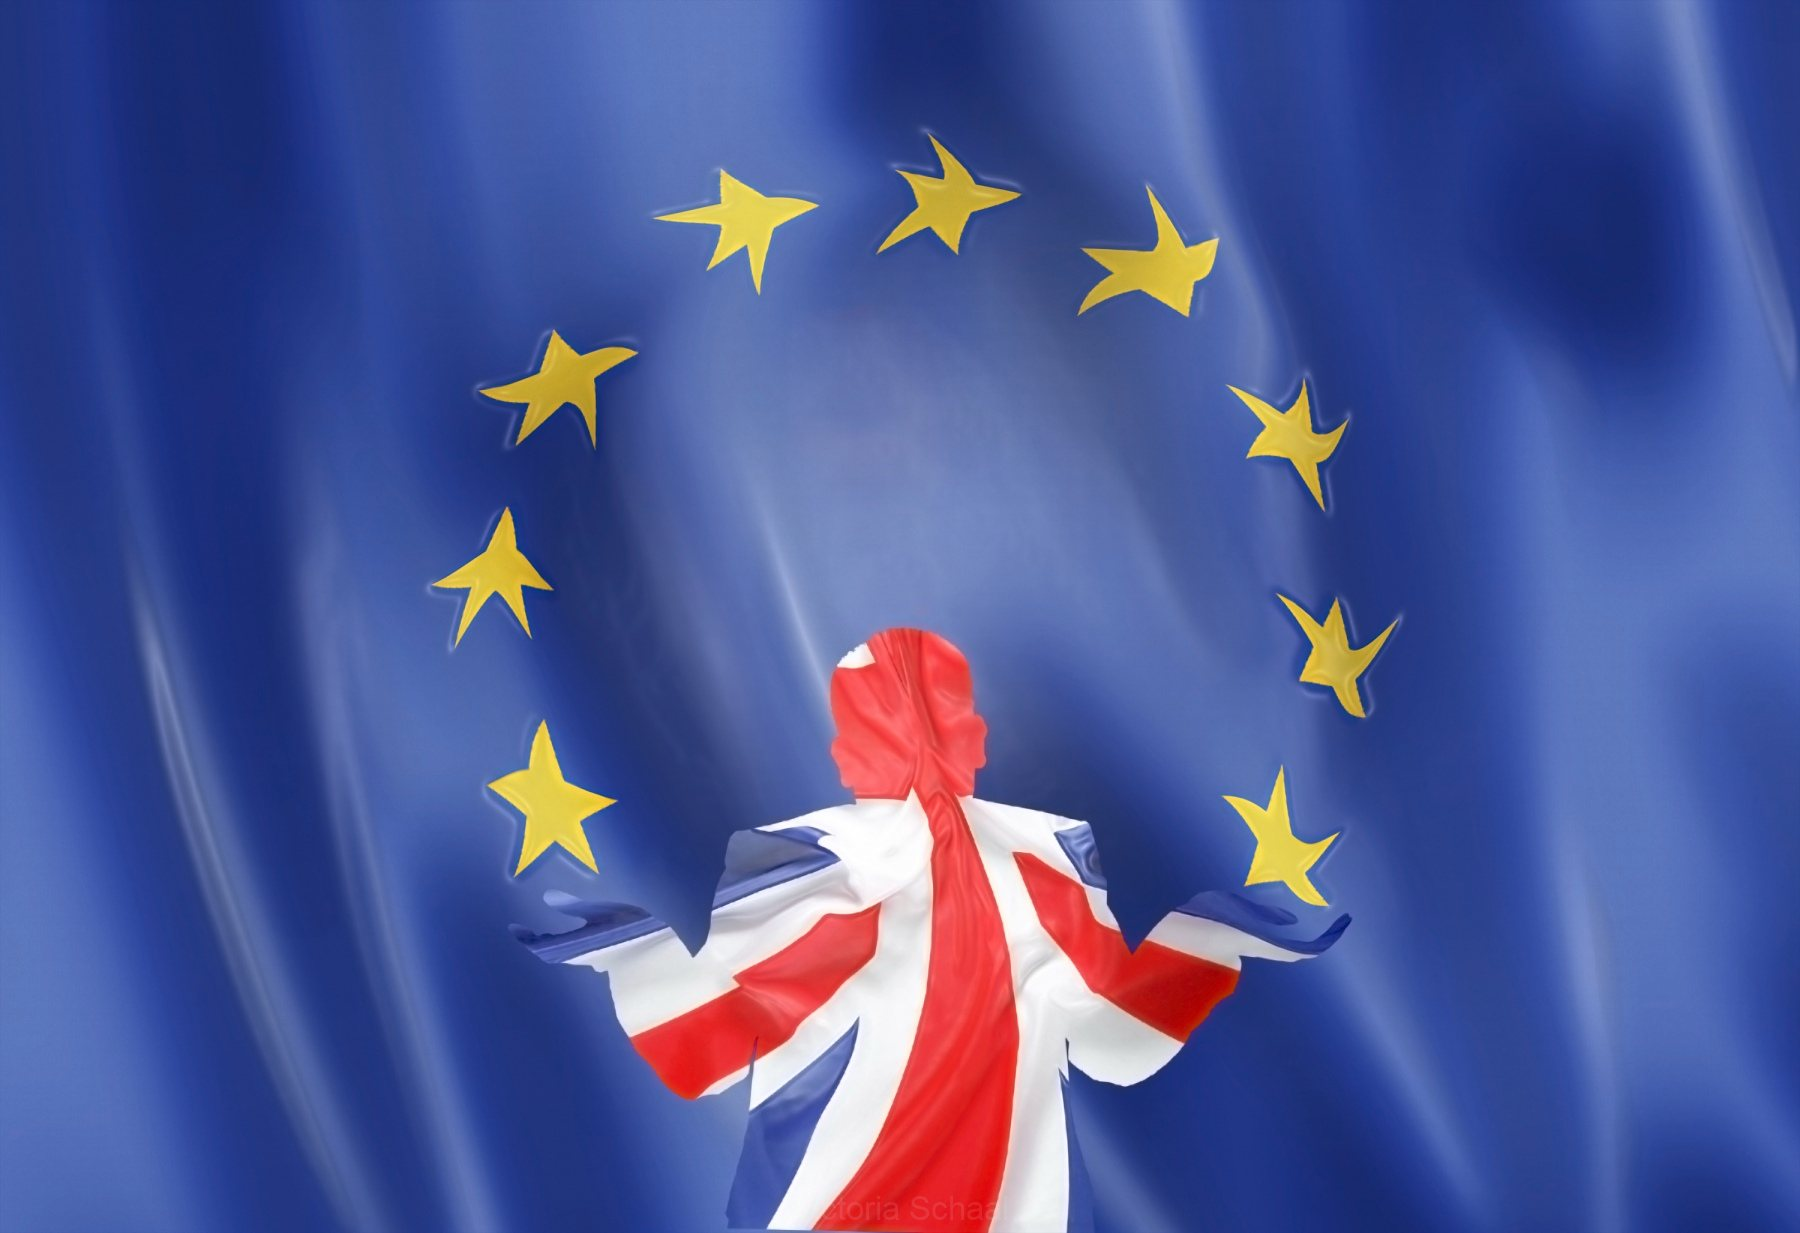 Conceptual ironic UK playing with EU stars